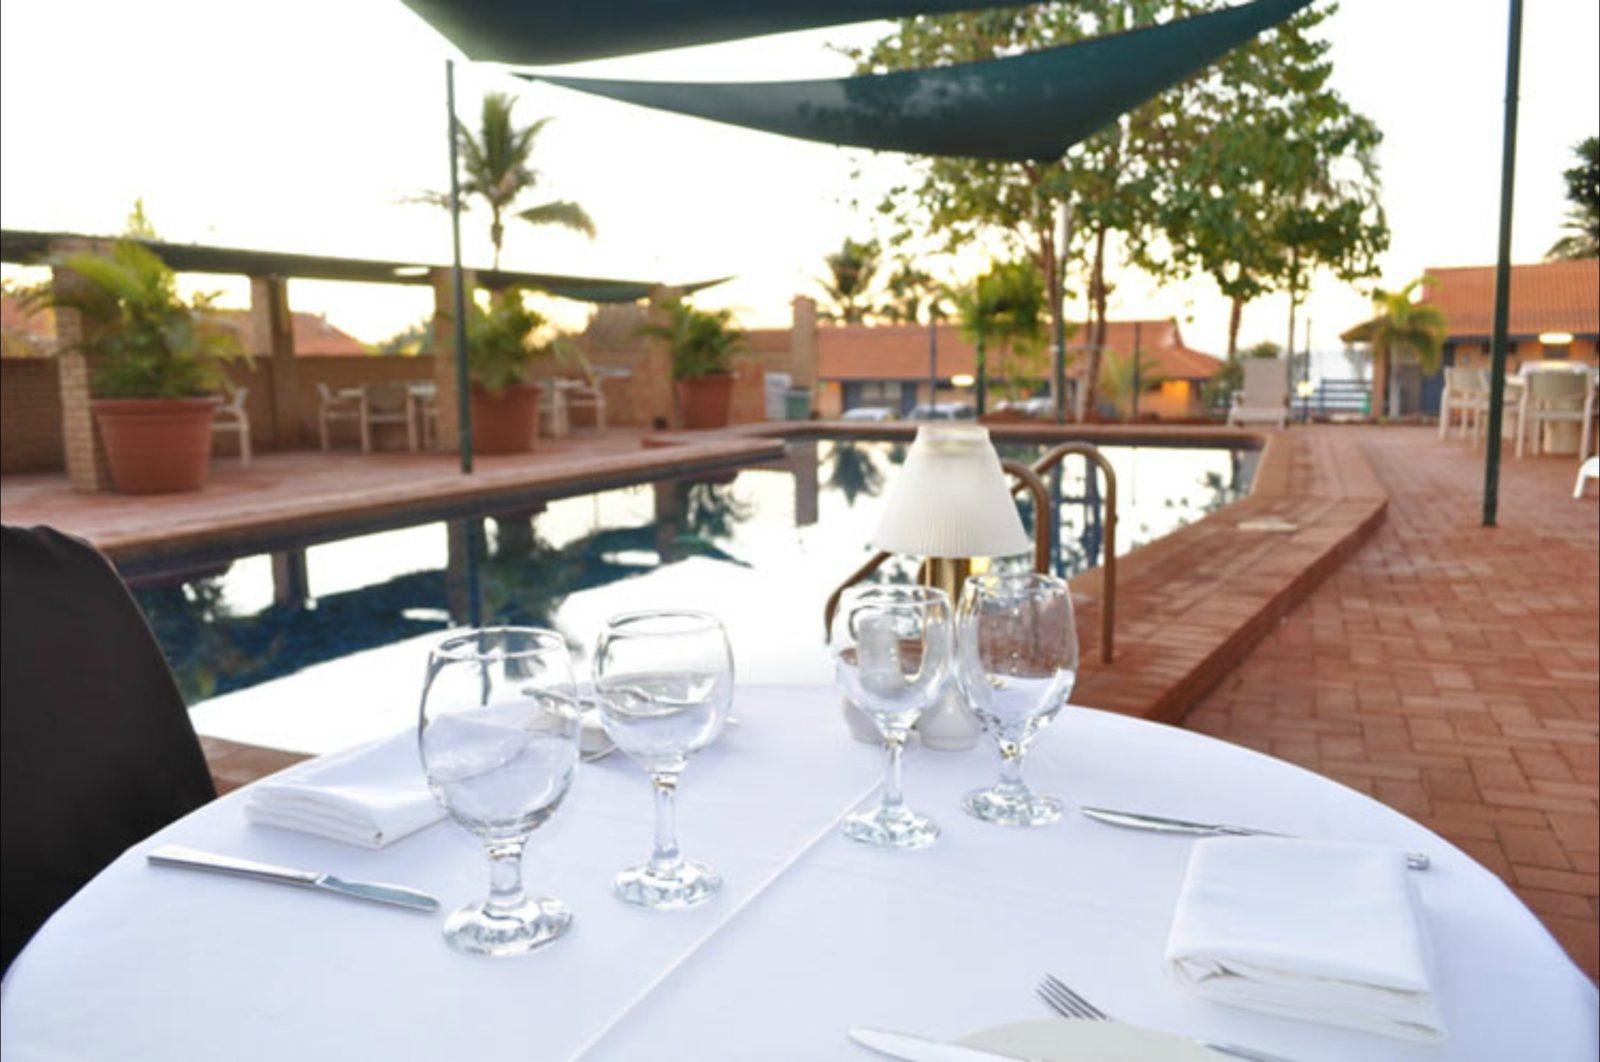 Hospitality Inn Port Hedland, Port Hedland, Western Australia